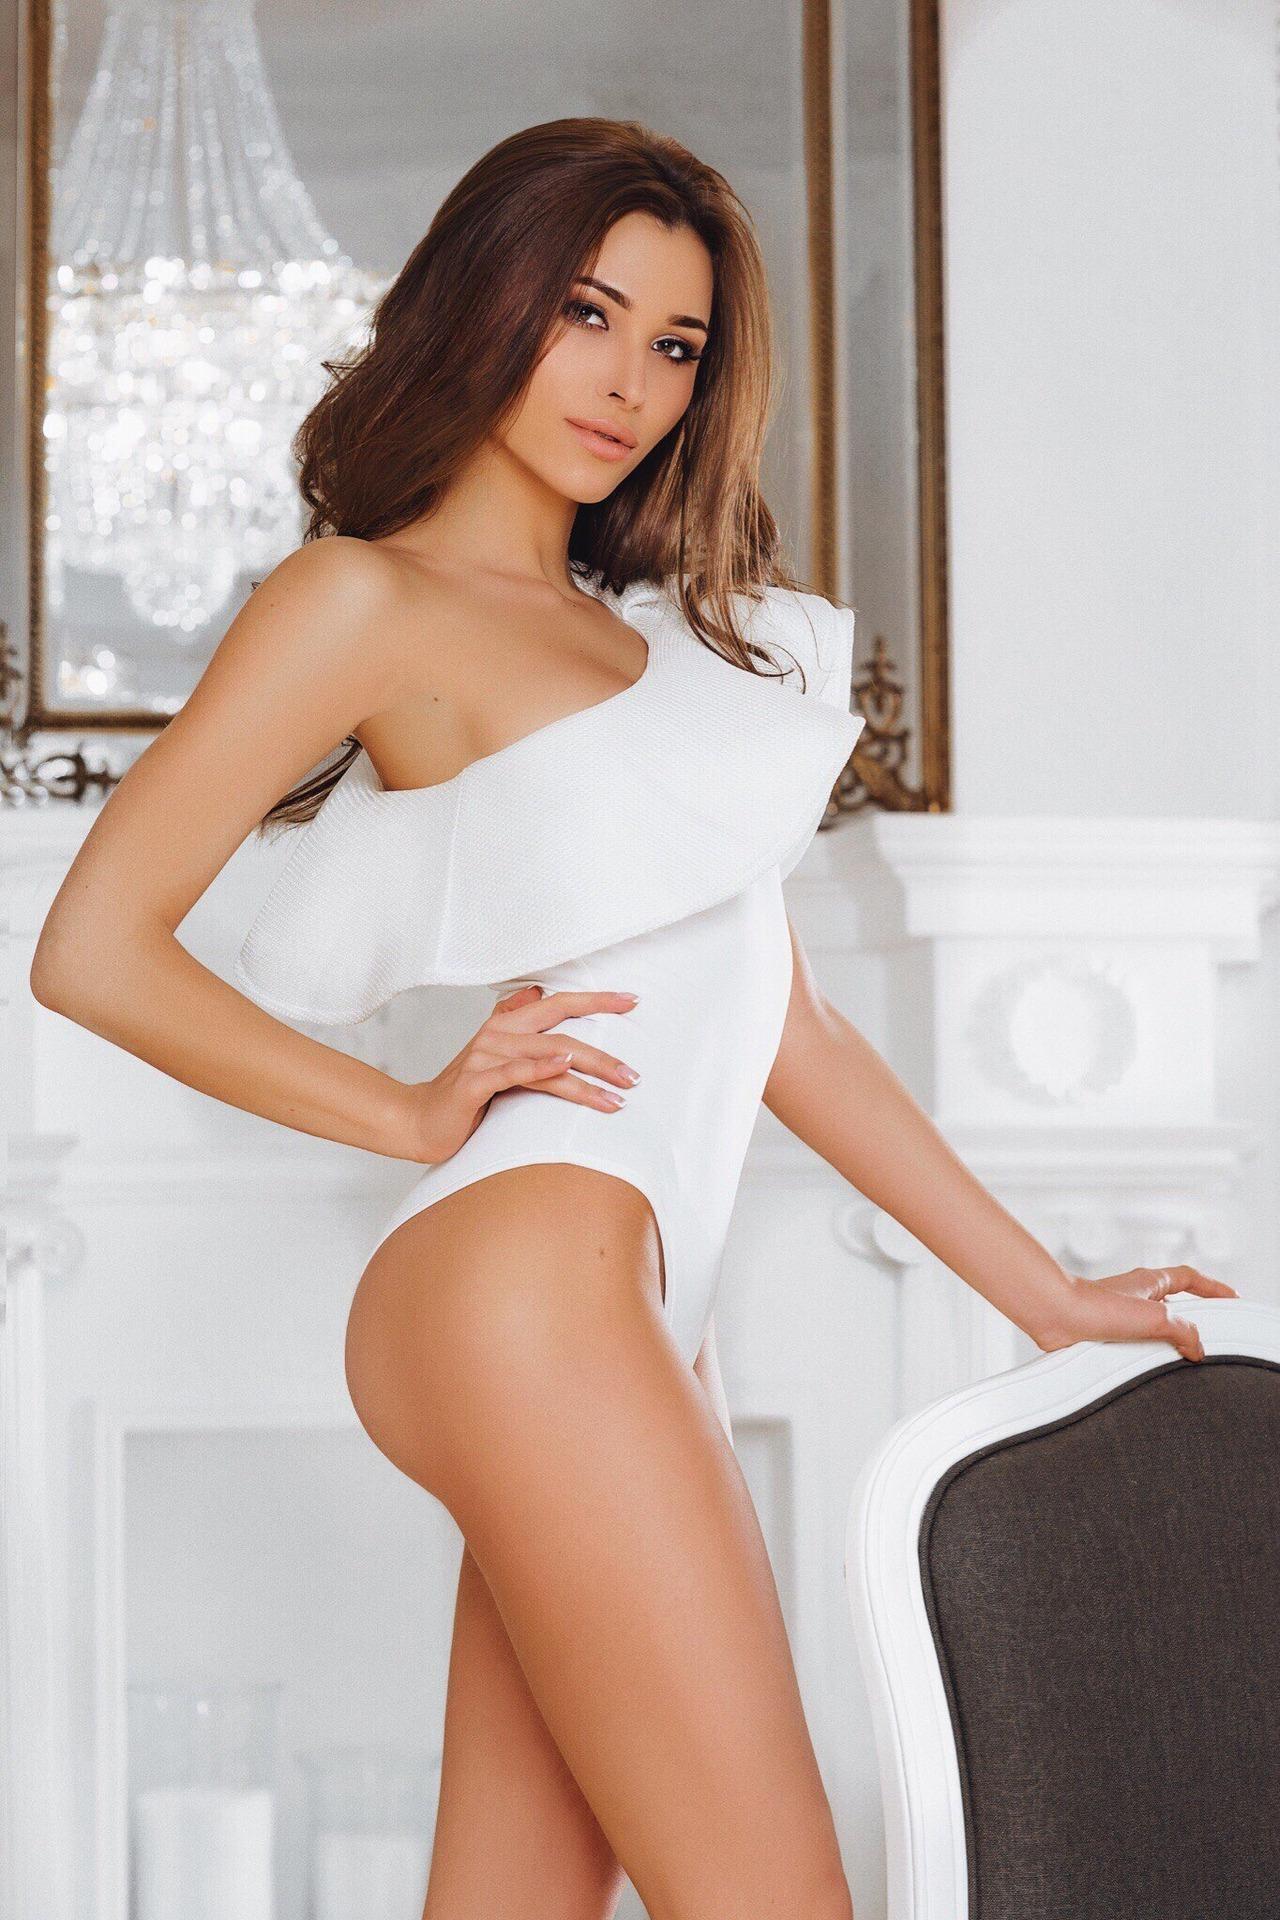 Natasha Zolotaryova